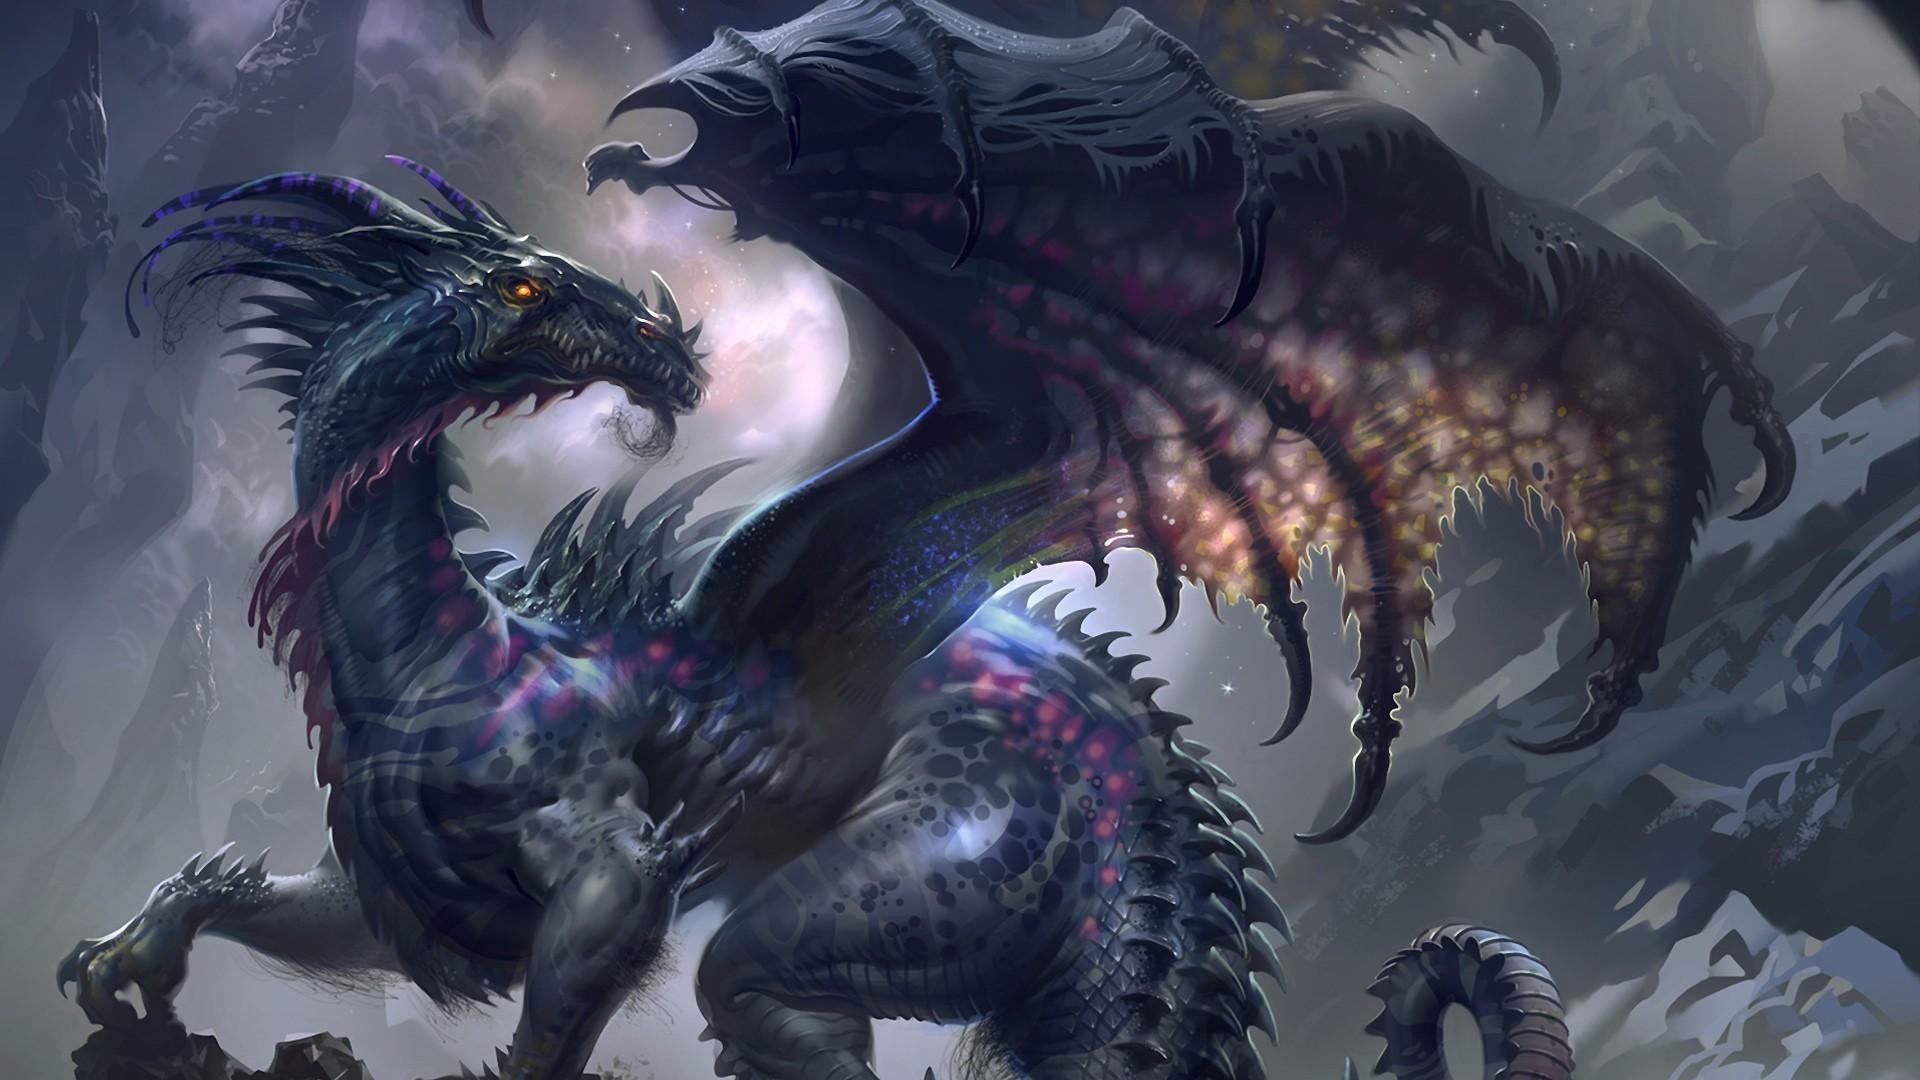 1920x1200 Badass Dragon Wallpaper High Definition